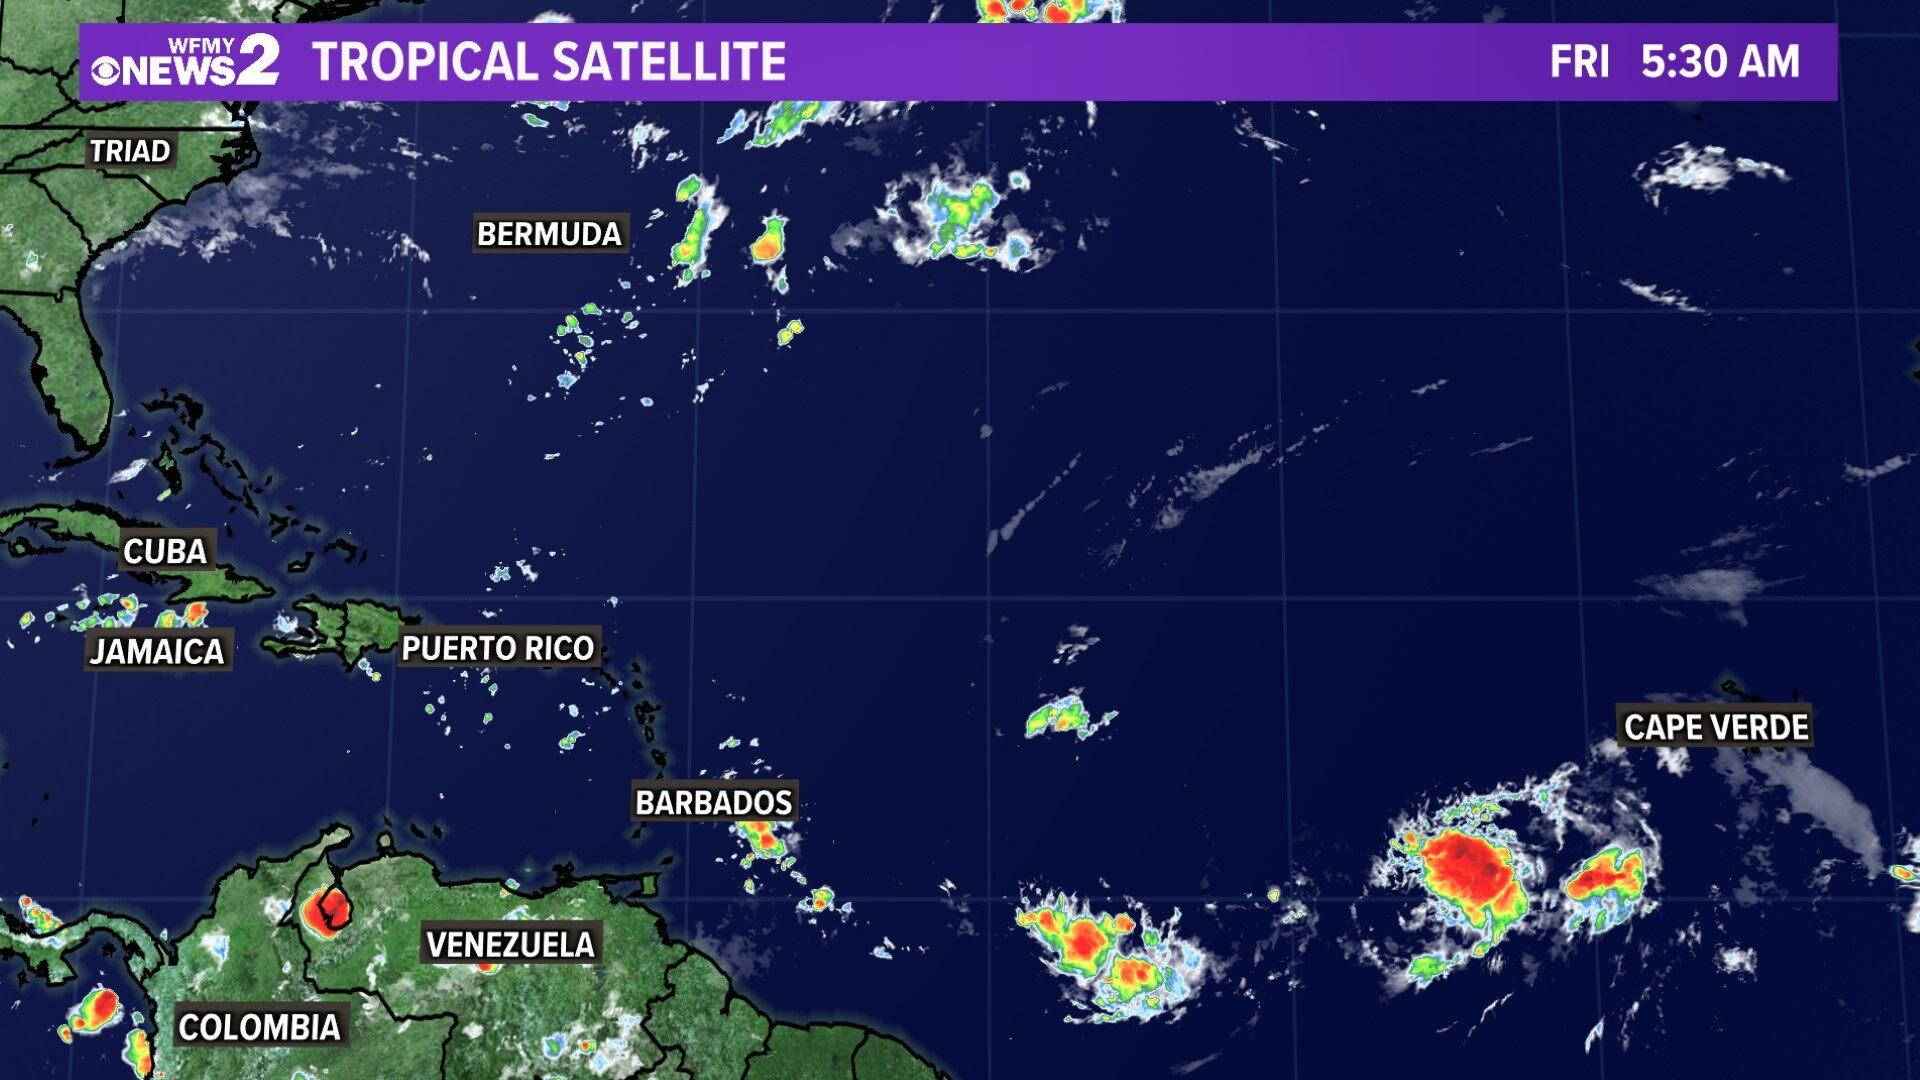 Tropical Satellite Atlantic